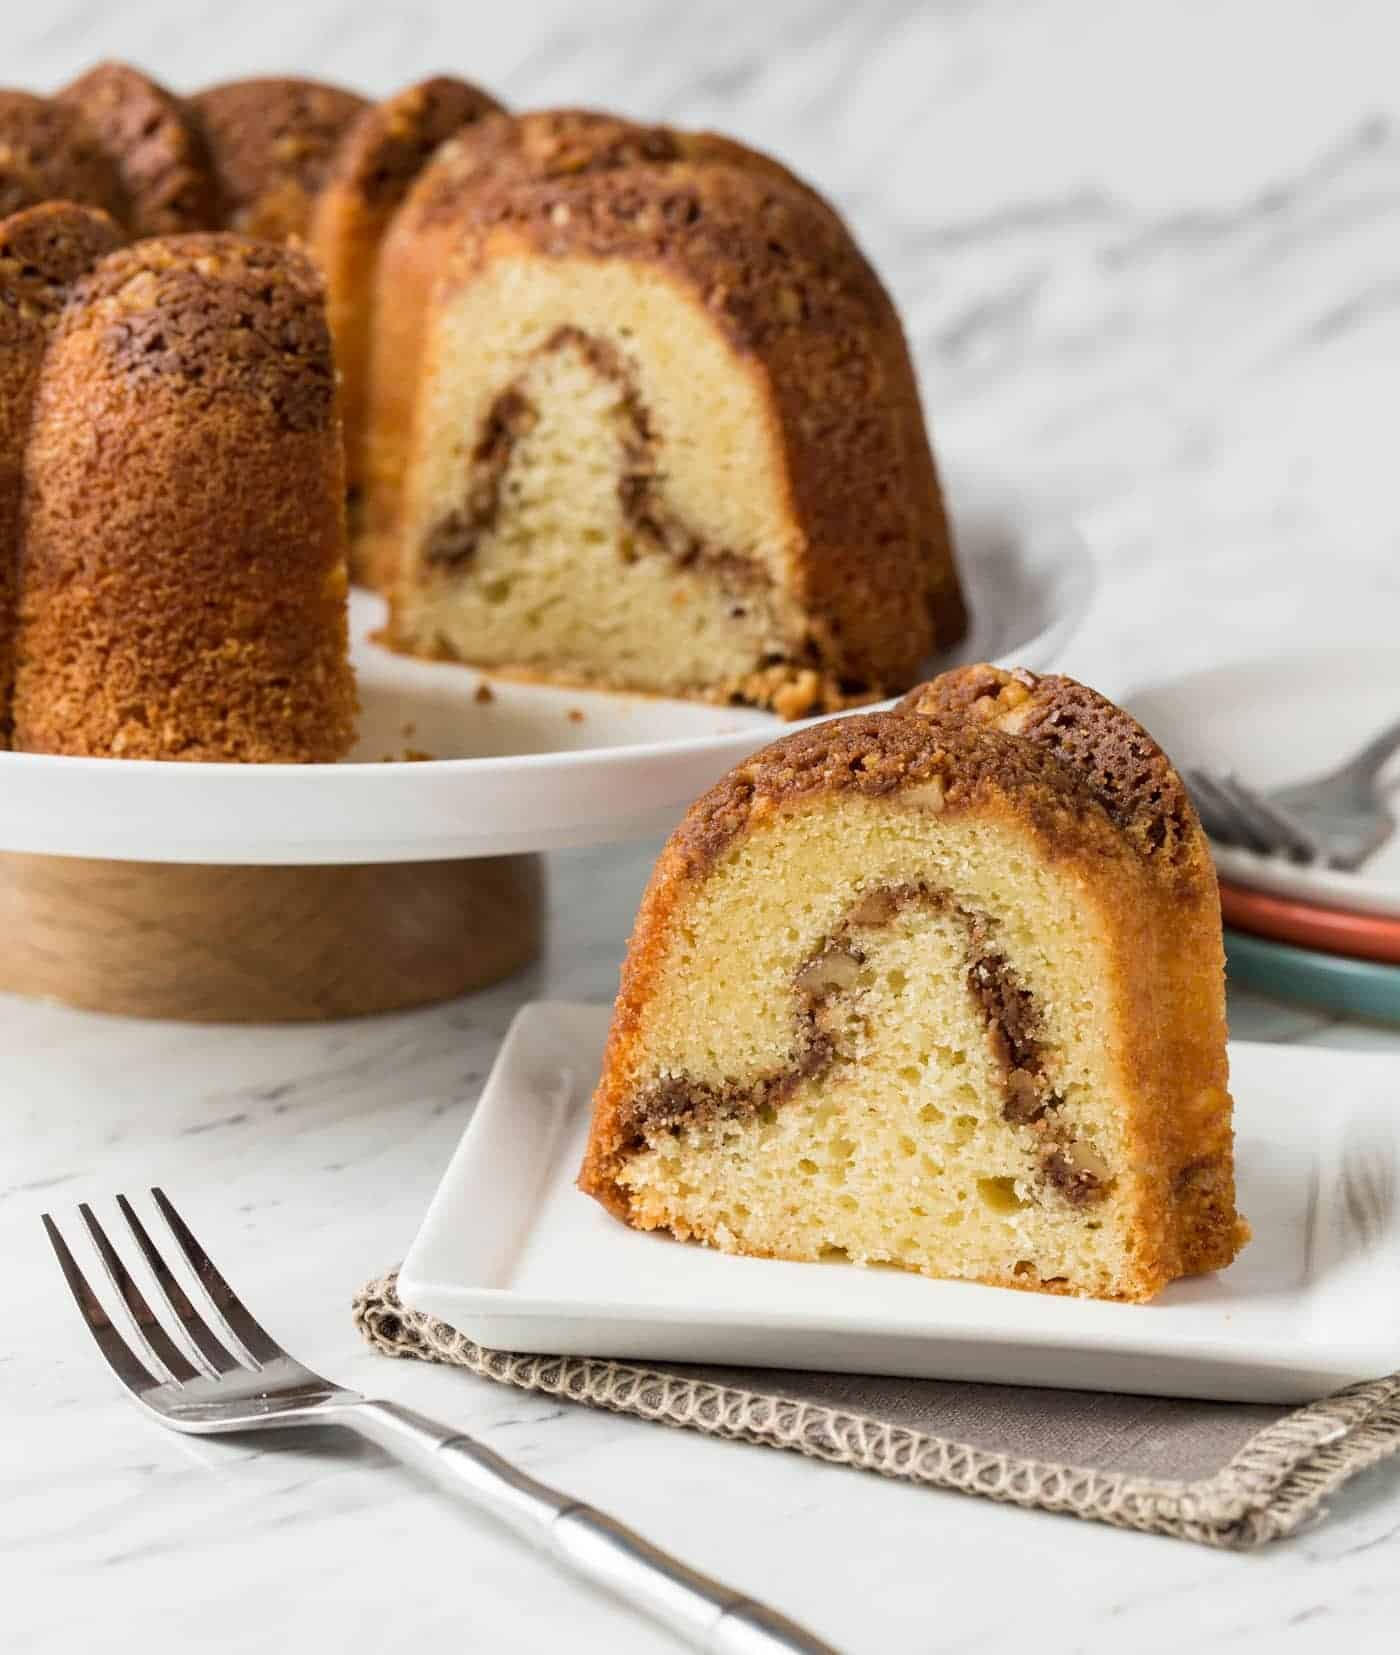 Grandma's Sour Cream Coffee Cake Garnish with Lemon in 2020